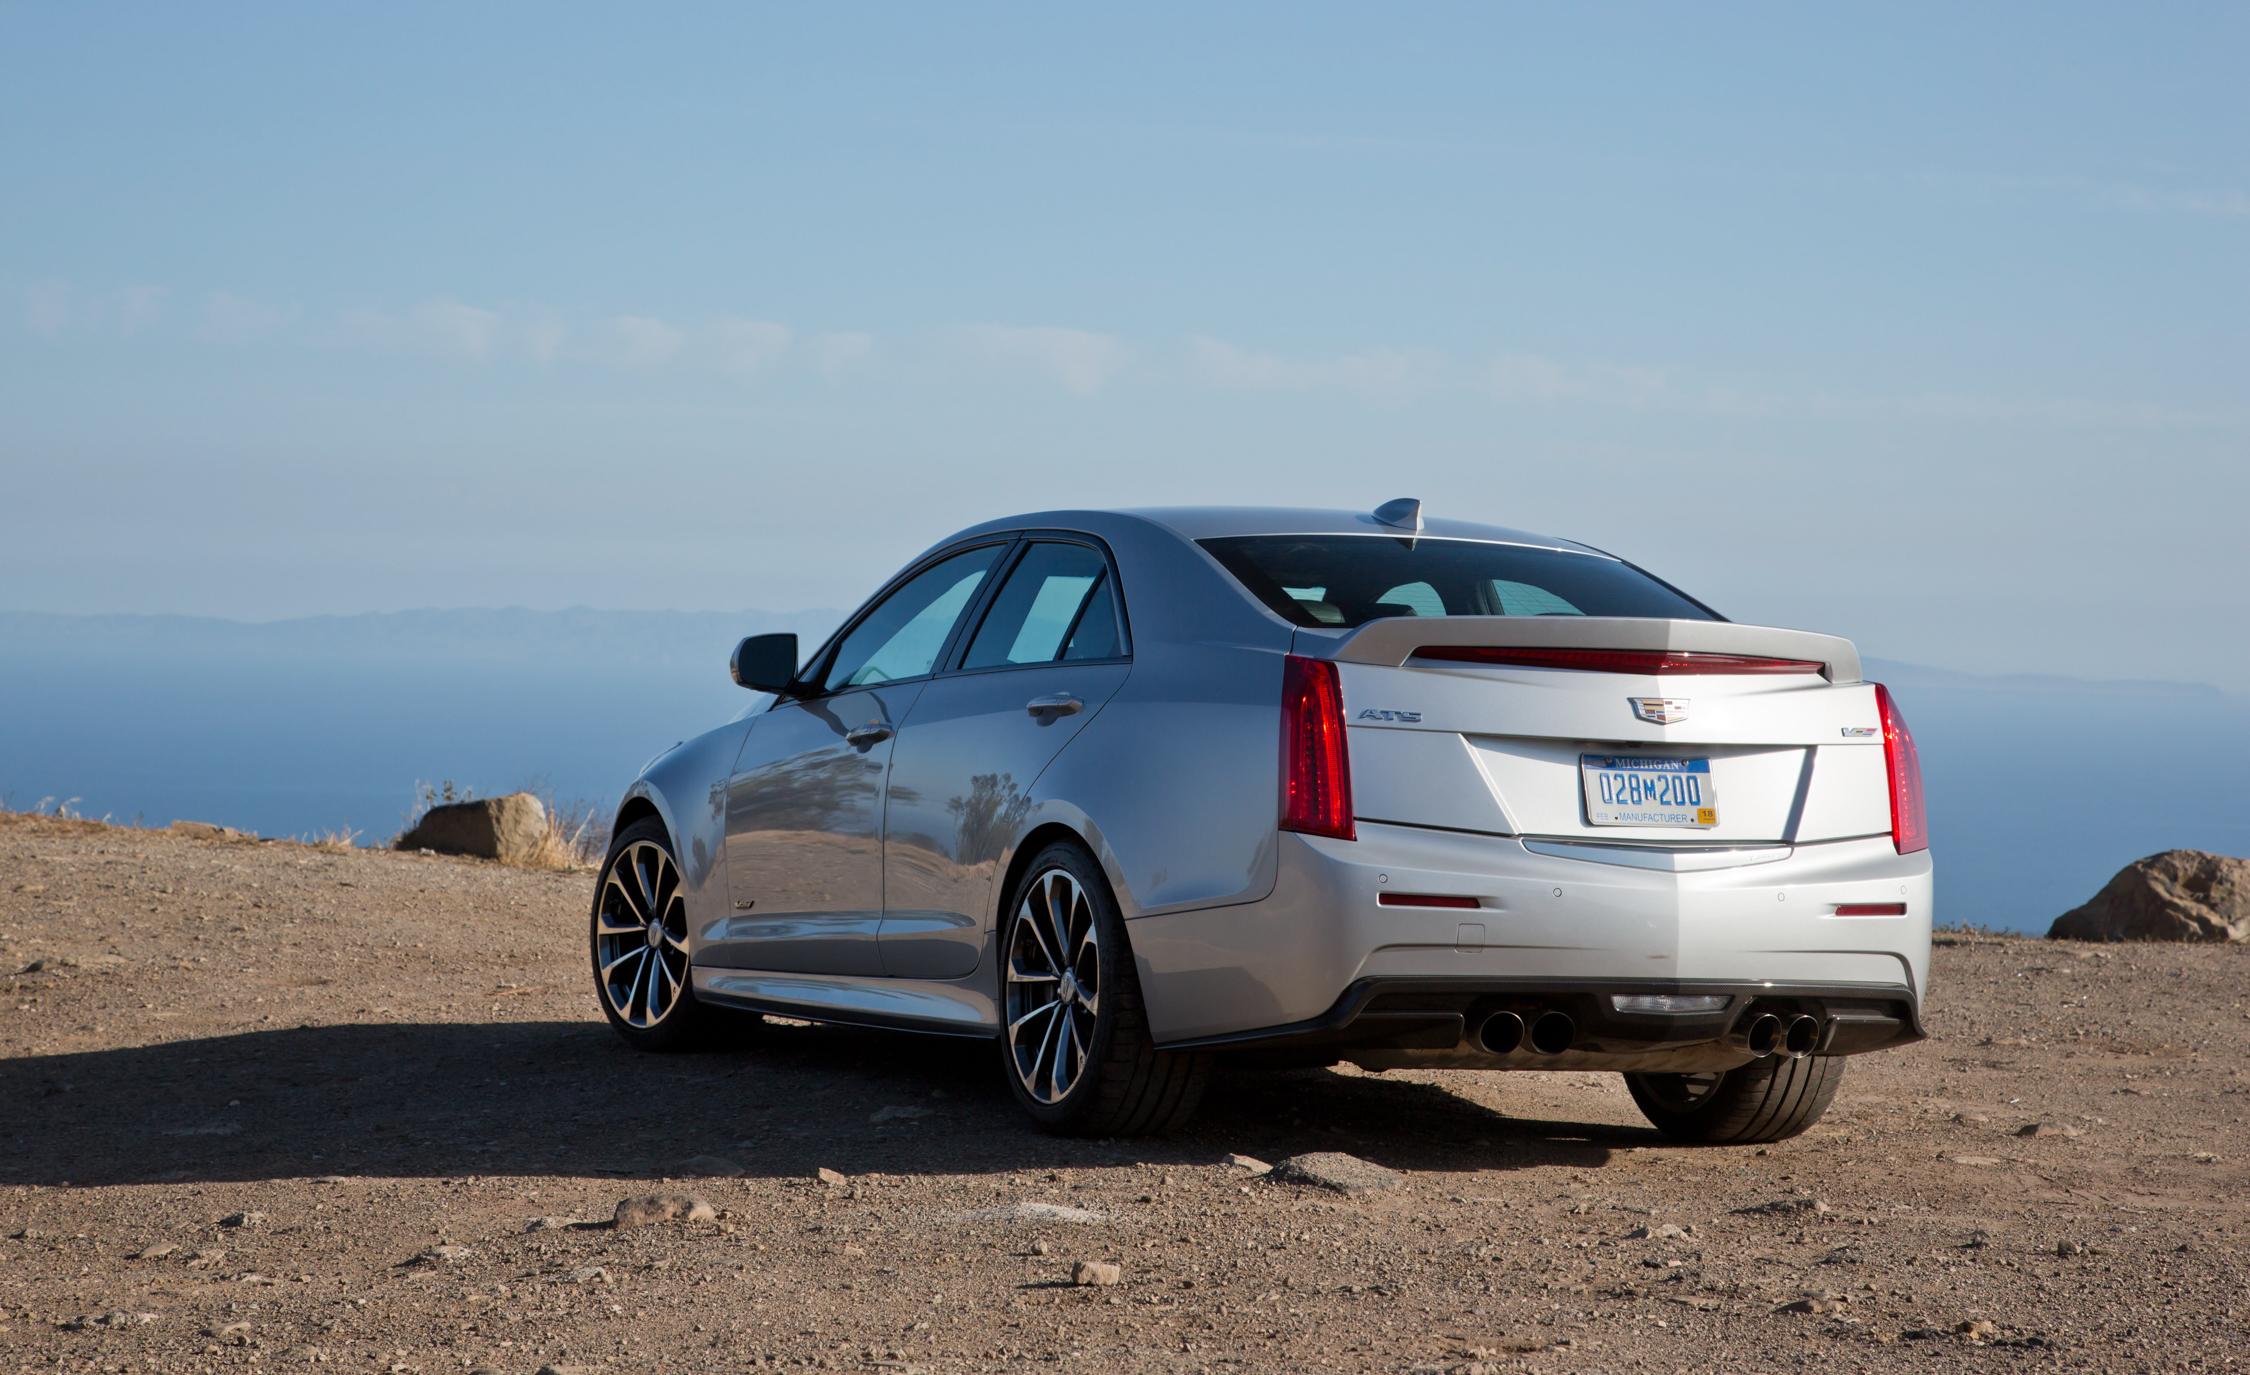 2016 Cadillac ATS-V Rear Side Exterior Design